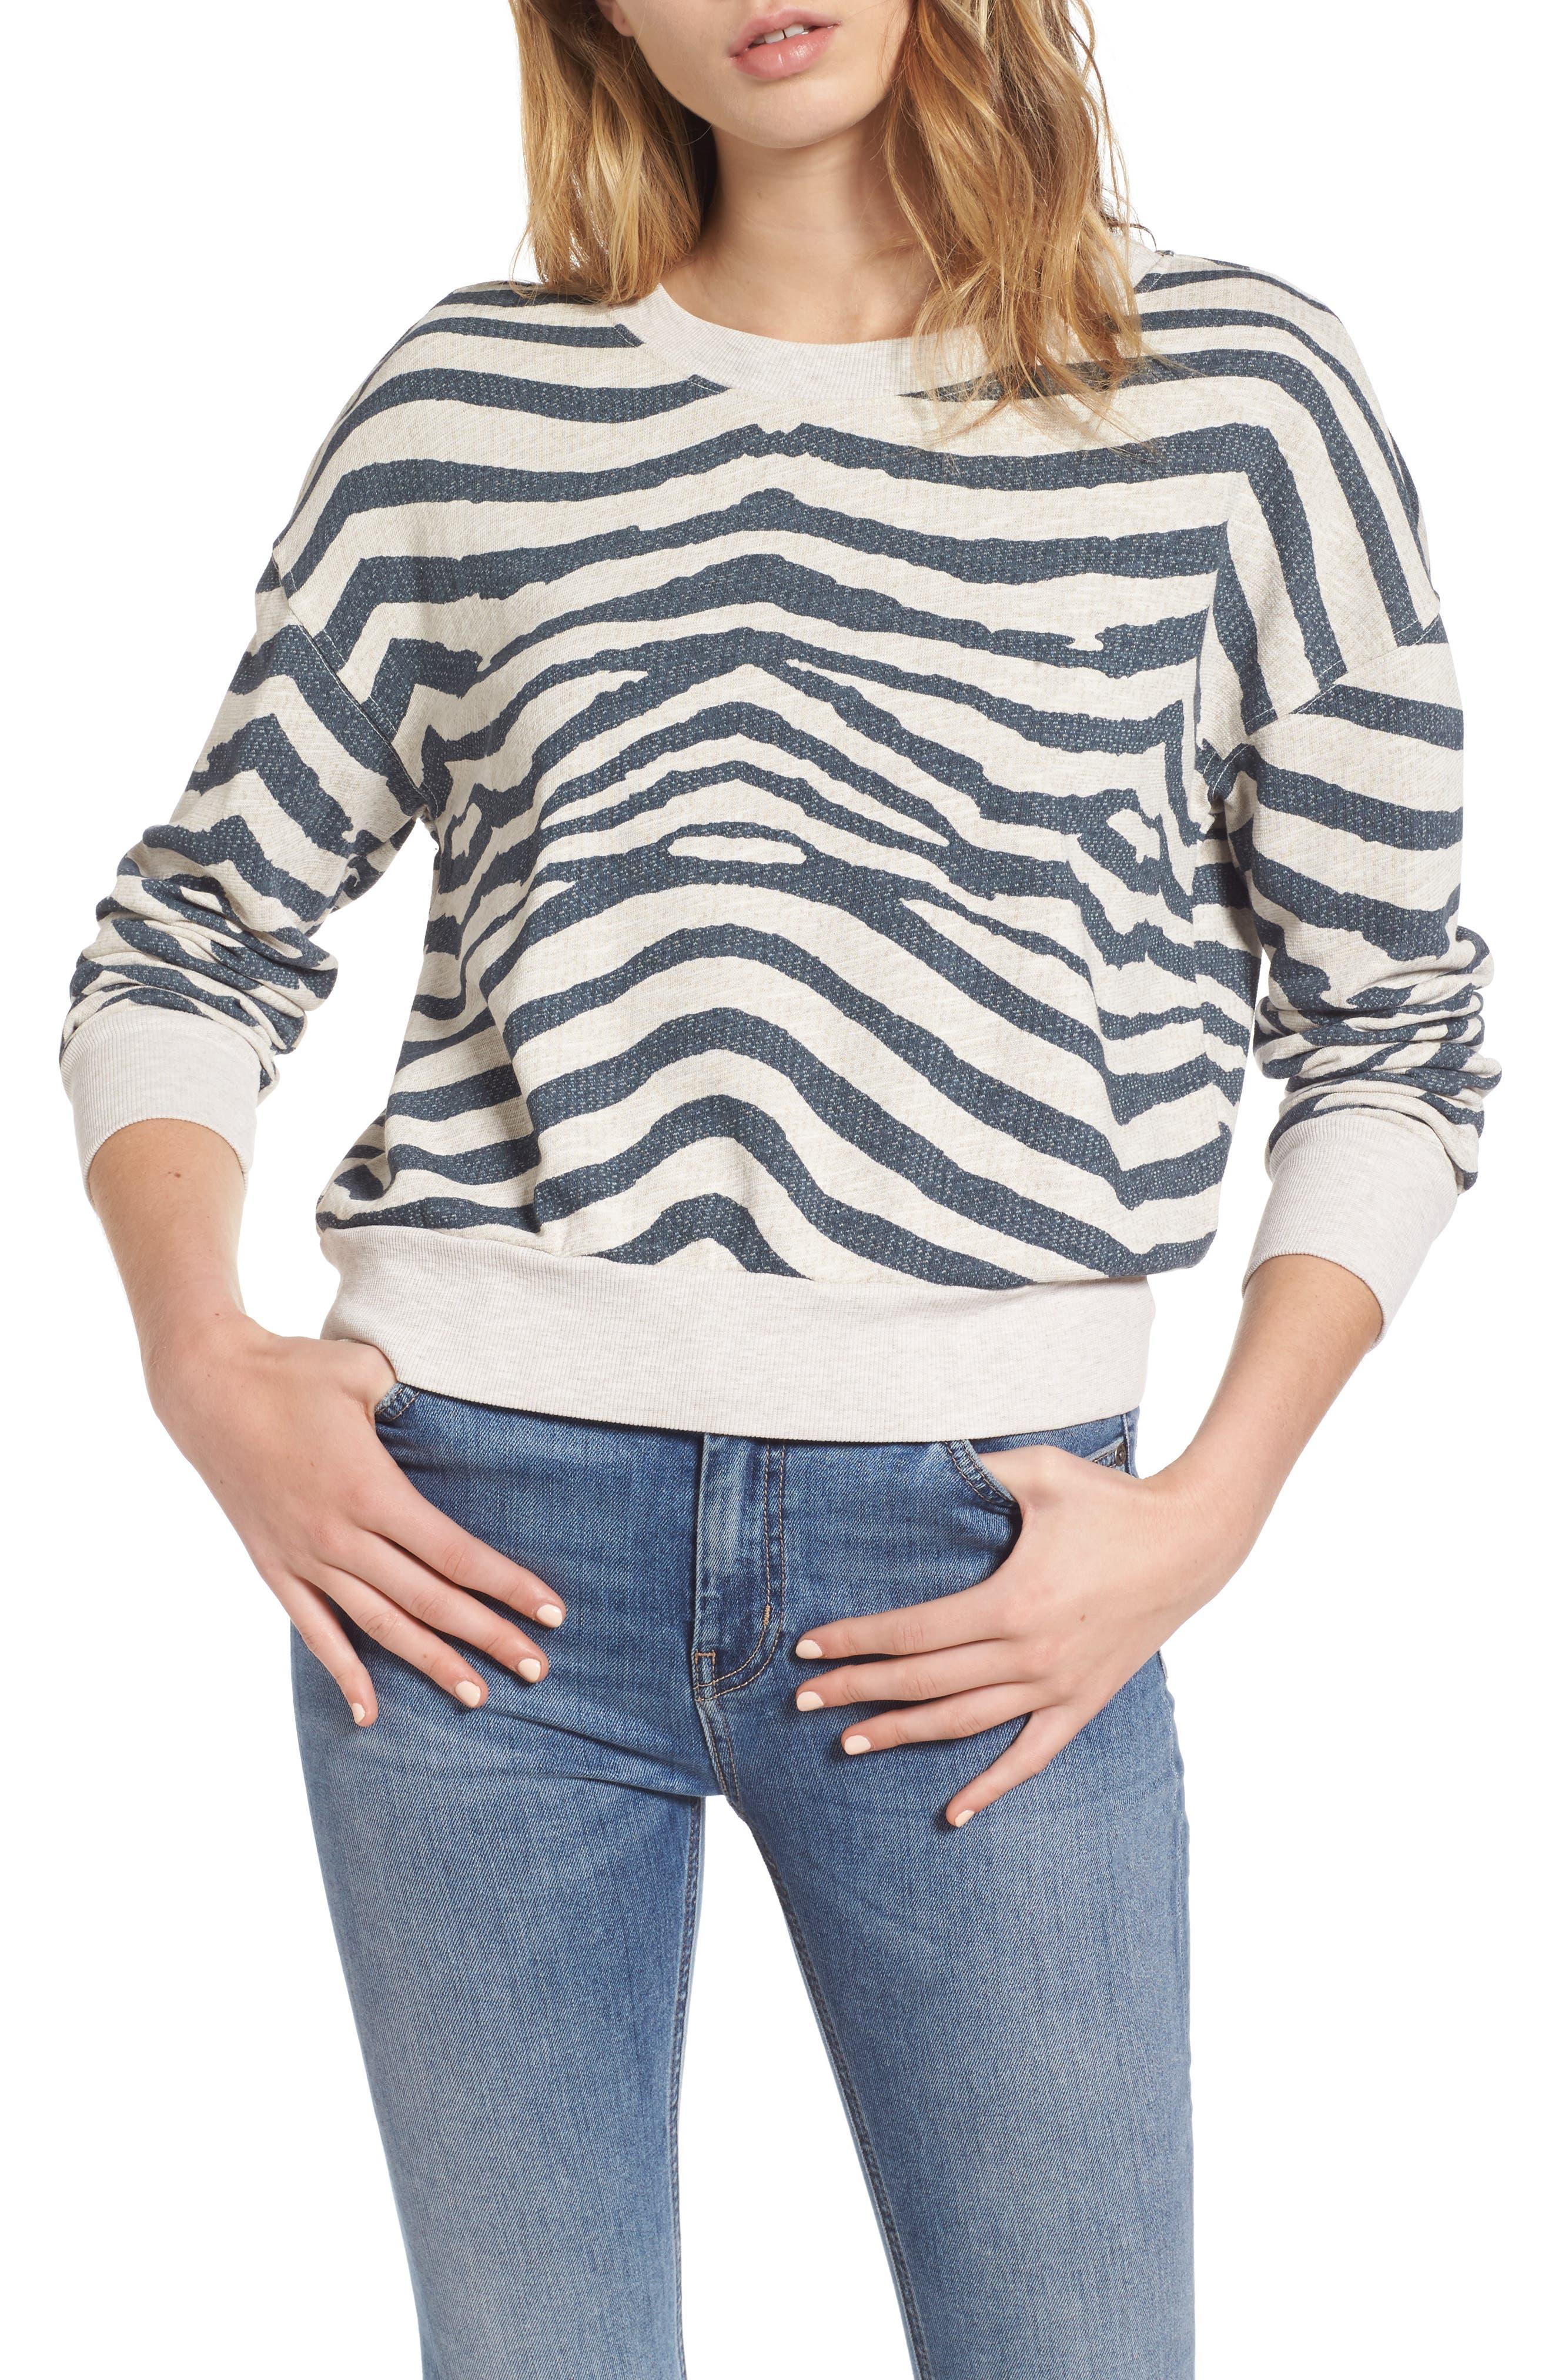 SPLENDID Zebra Print Sweatshirt